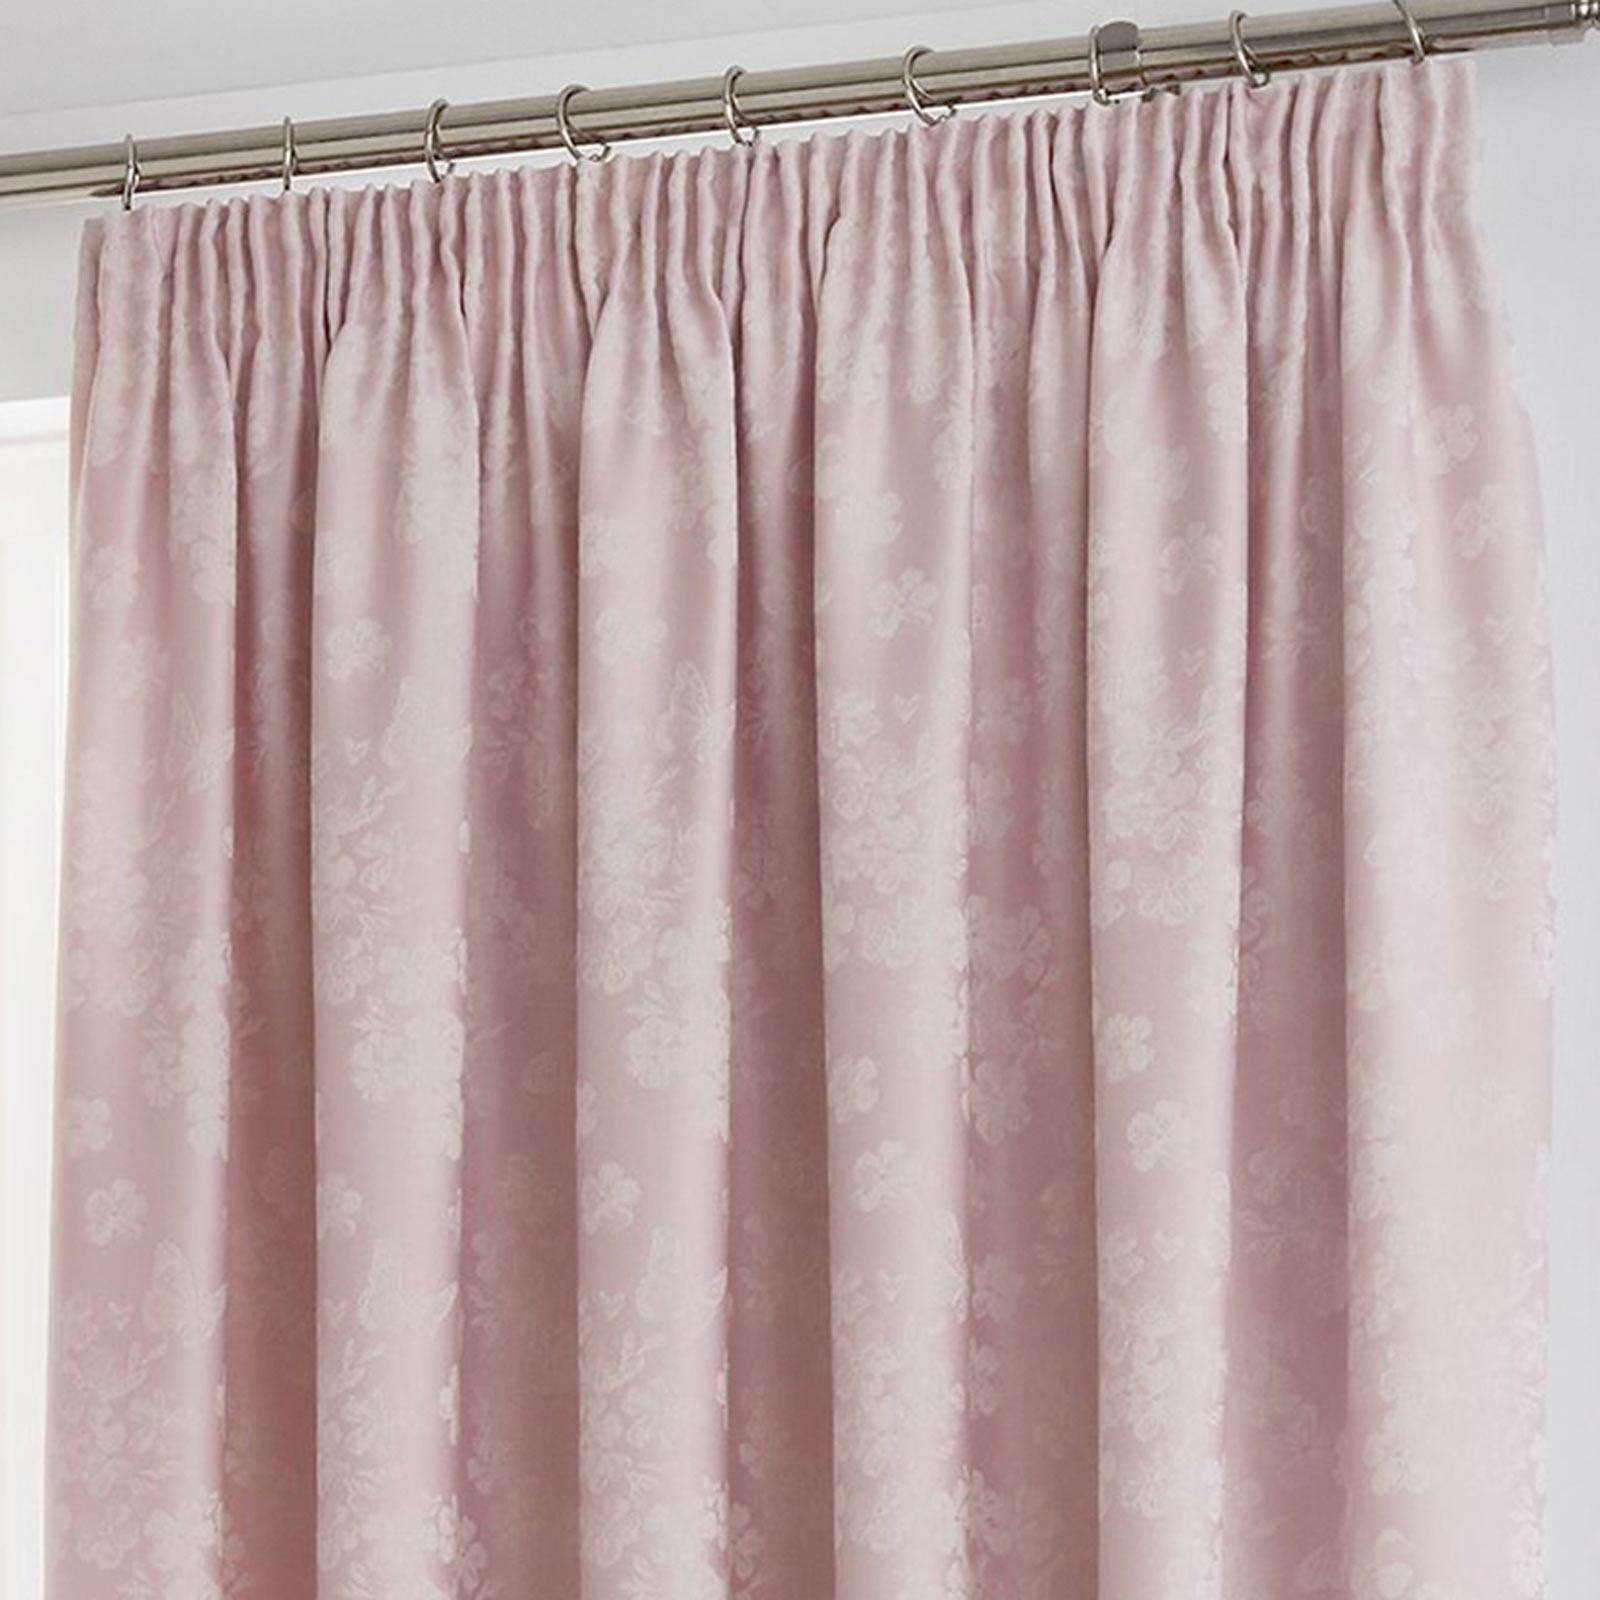 Fundas-de-Edredon-Rosa-Blush-Jacquard-Floral-Cubierta-Del-Edredon-Conjuntos-de-Ropa-de-cama-de-lujo miniatura 25